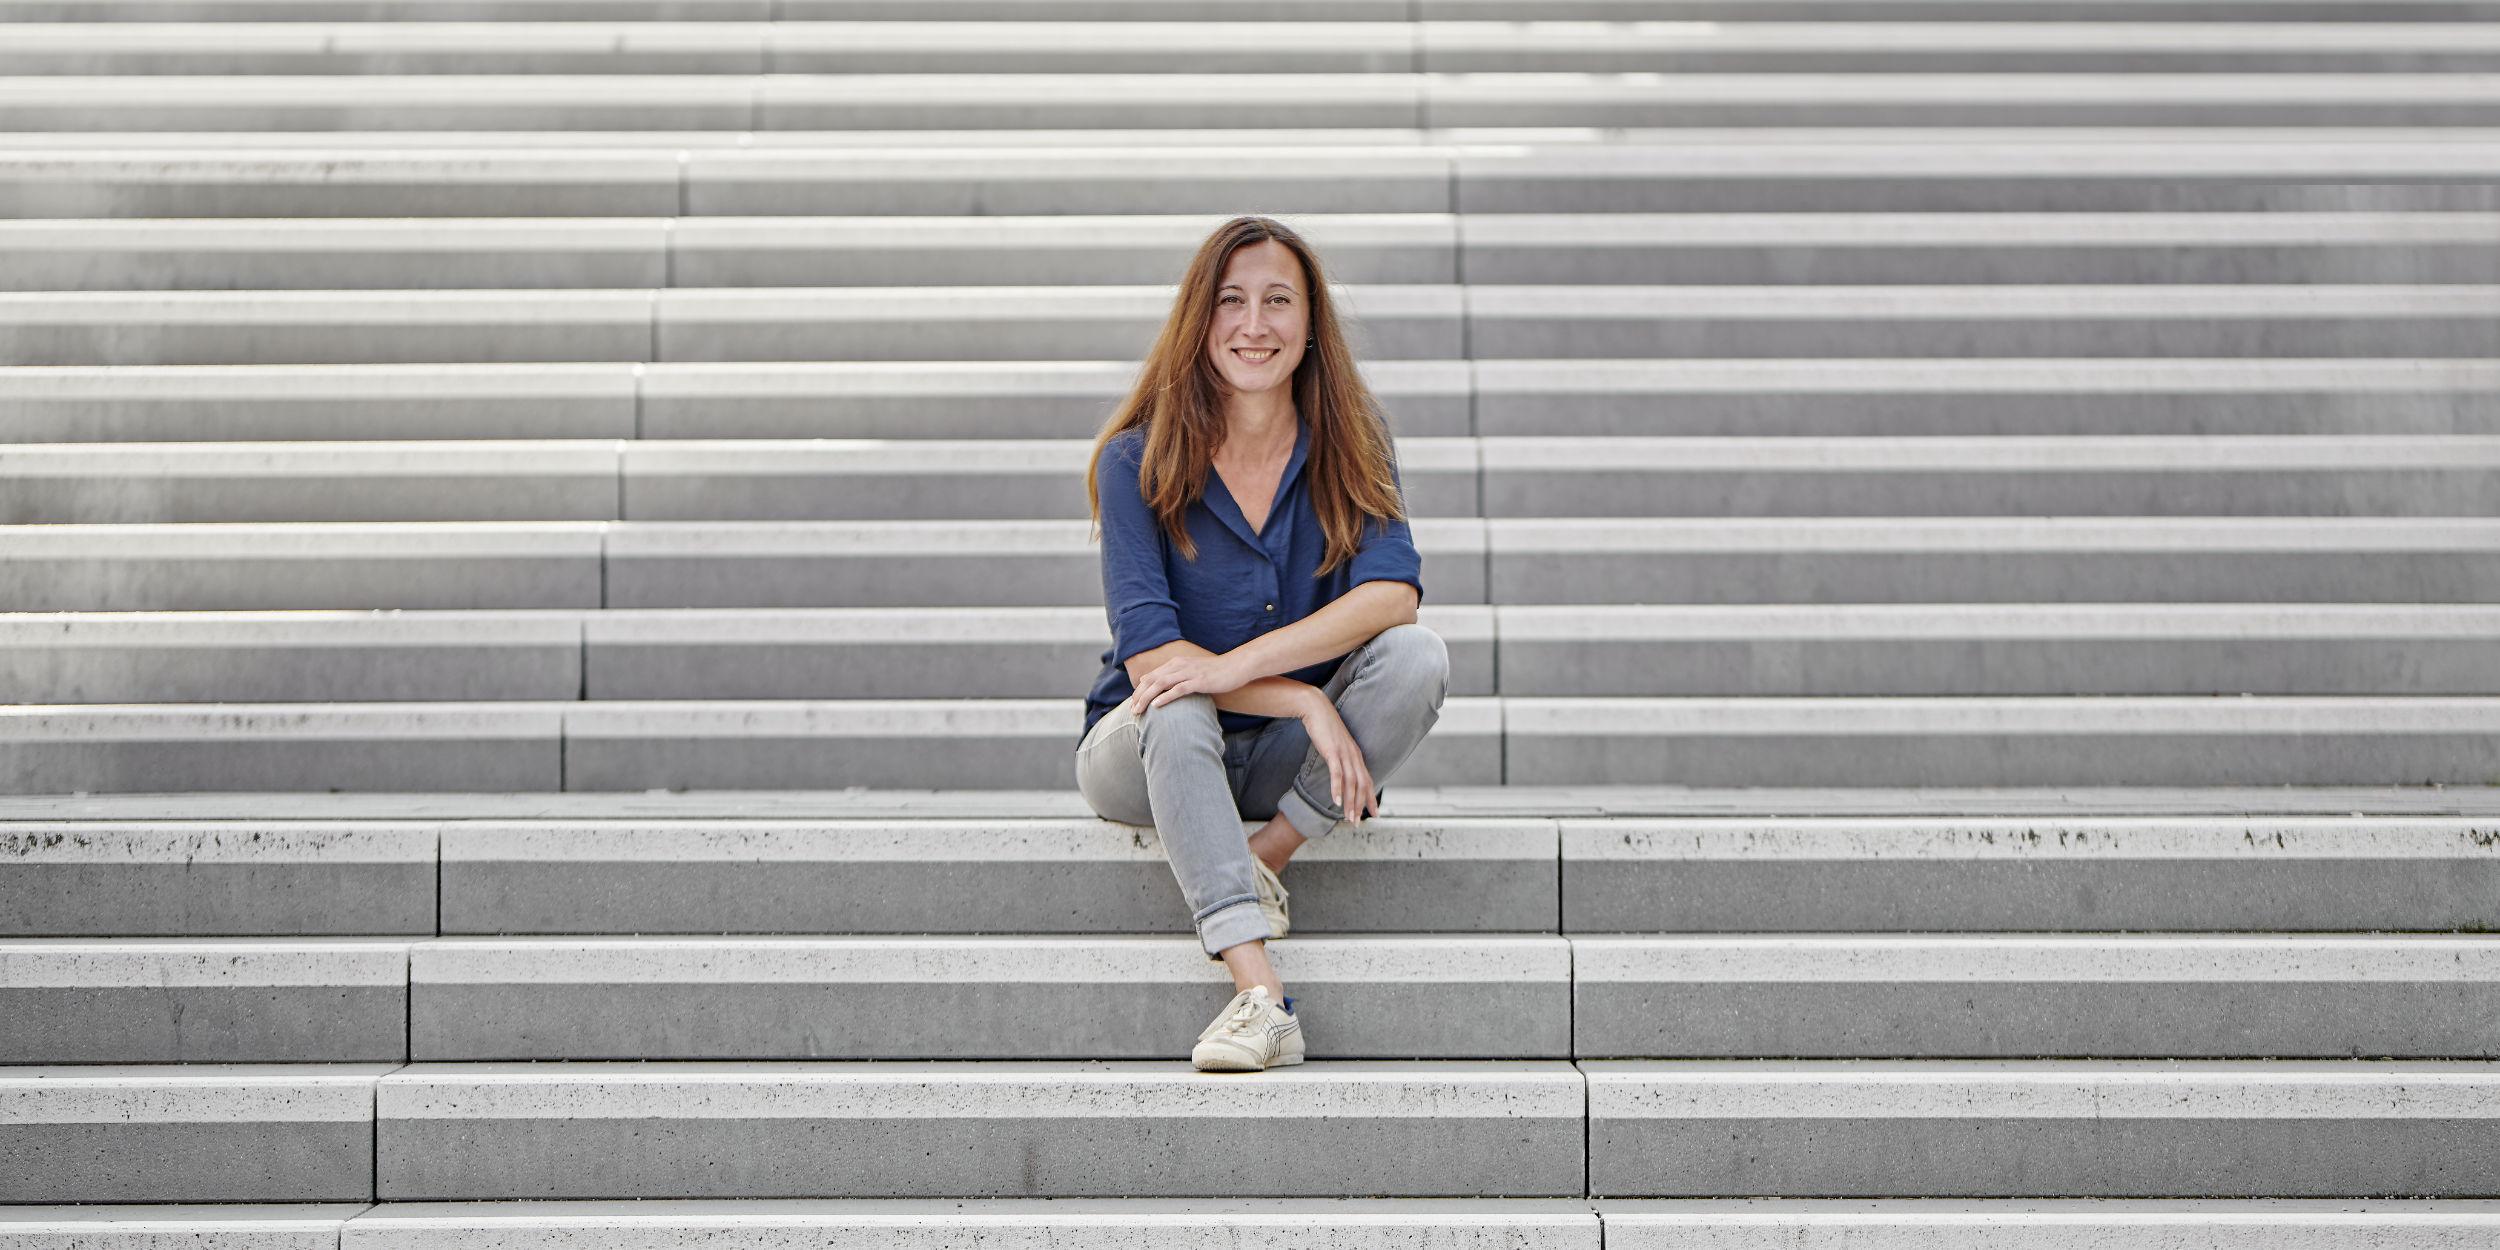 People Fotografie Stuttgart und Umgebung Charakter Portrait junge Frau Sympathisch lächelnd Martina Krägeloh Supervison Coaching Workshops Berlin